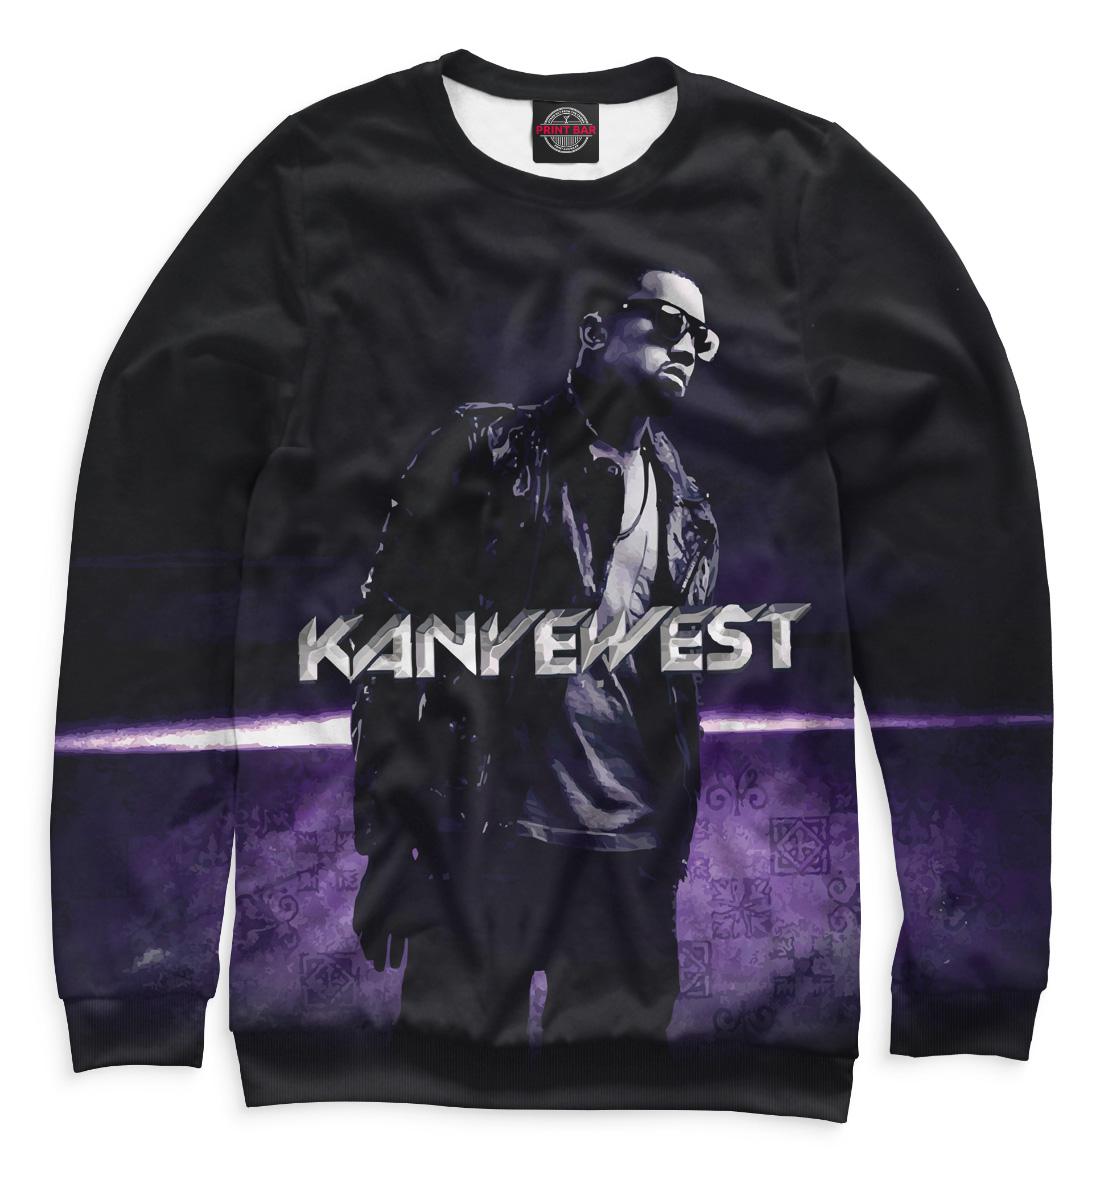 Купить Kanye West, Printbar, Свитшоты, KAW-291290-swi-1